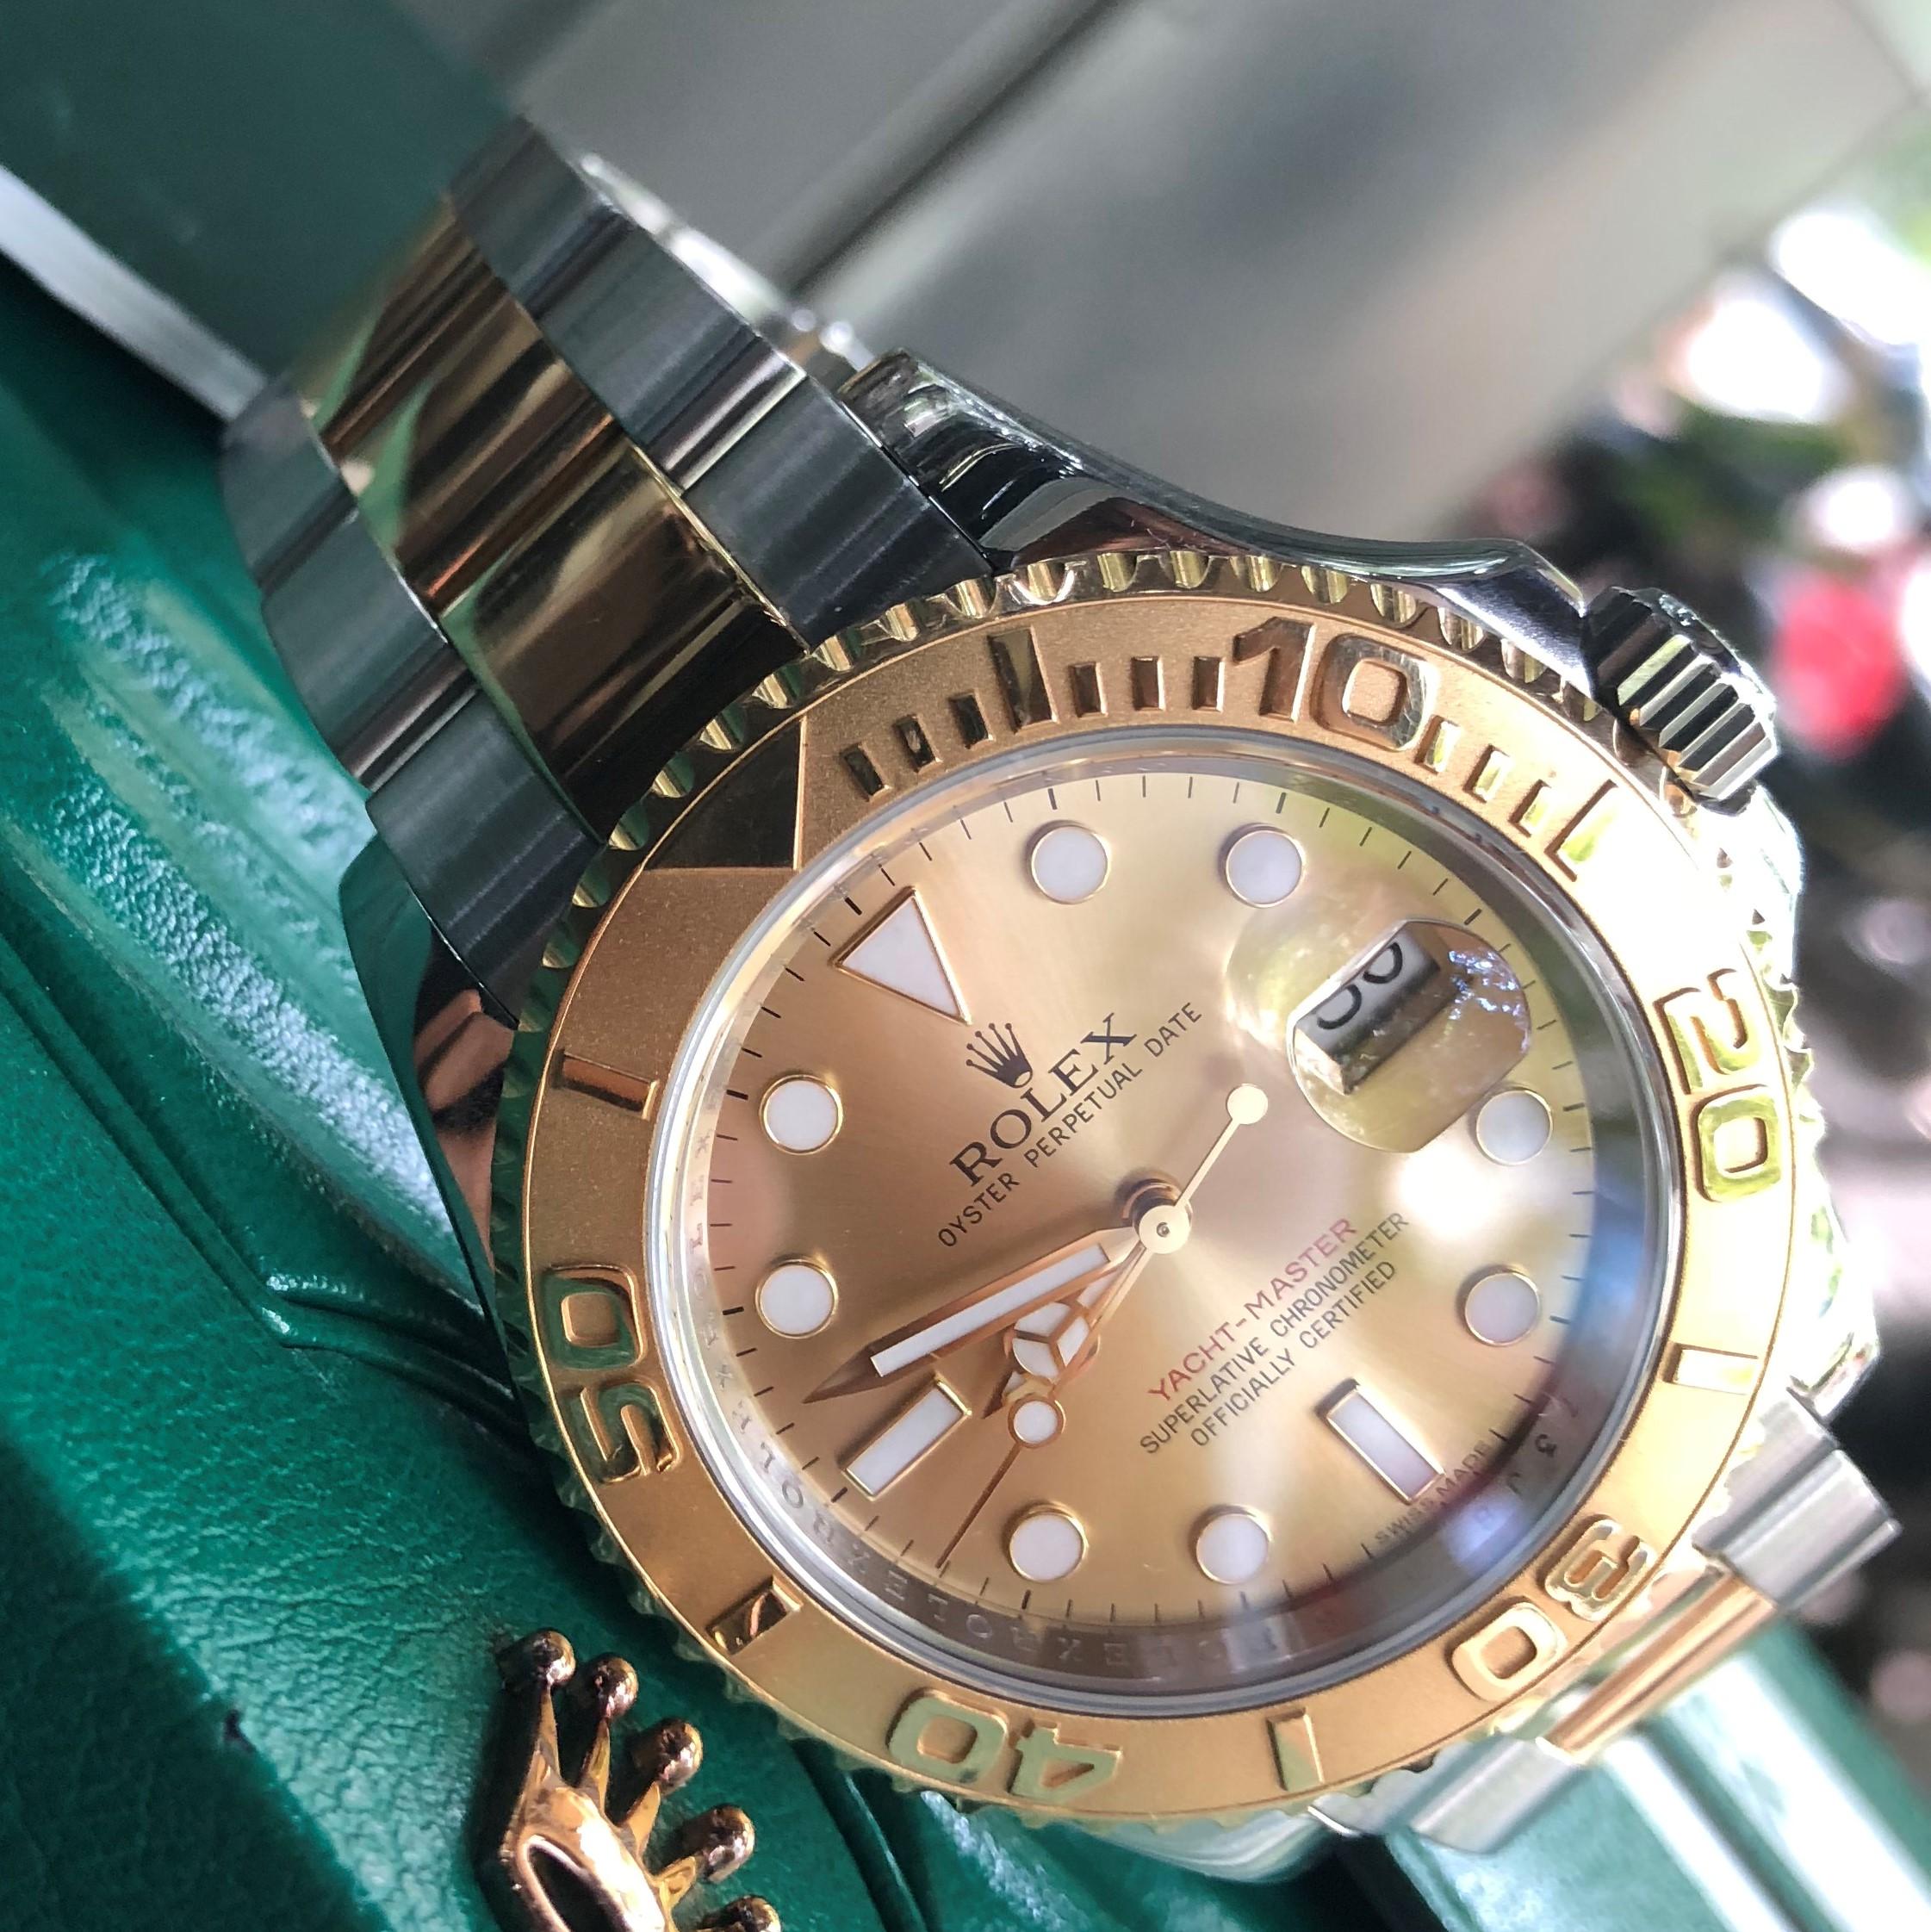 Rolex Yacht Master 16623 demi vàng 18k size 40mm Fullbox 2014